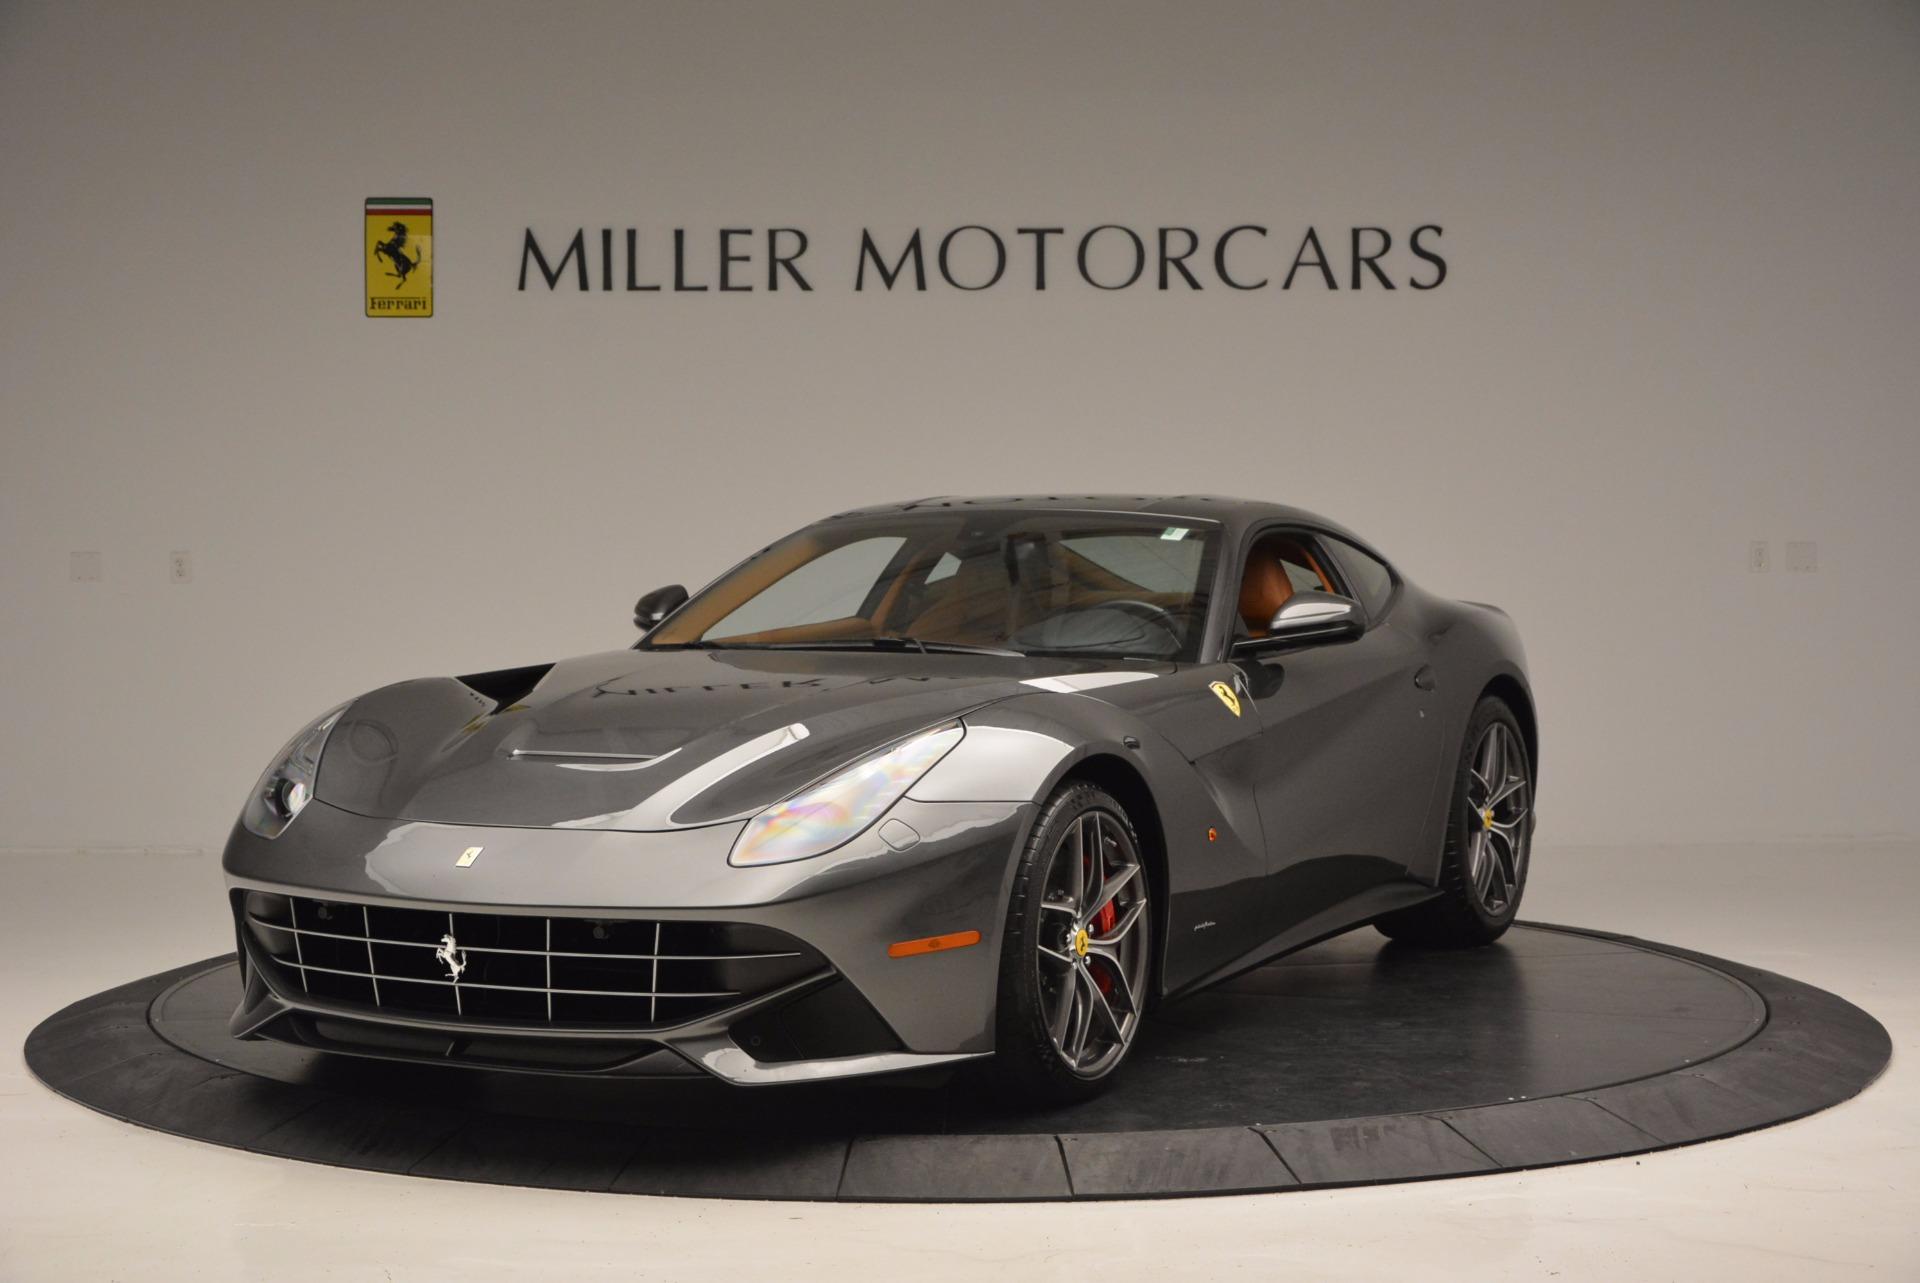 Used 2014 Ferrari F12 Berlinetta for sale Sold at Maserati of Westport in Westport CT 06880 1